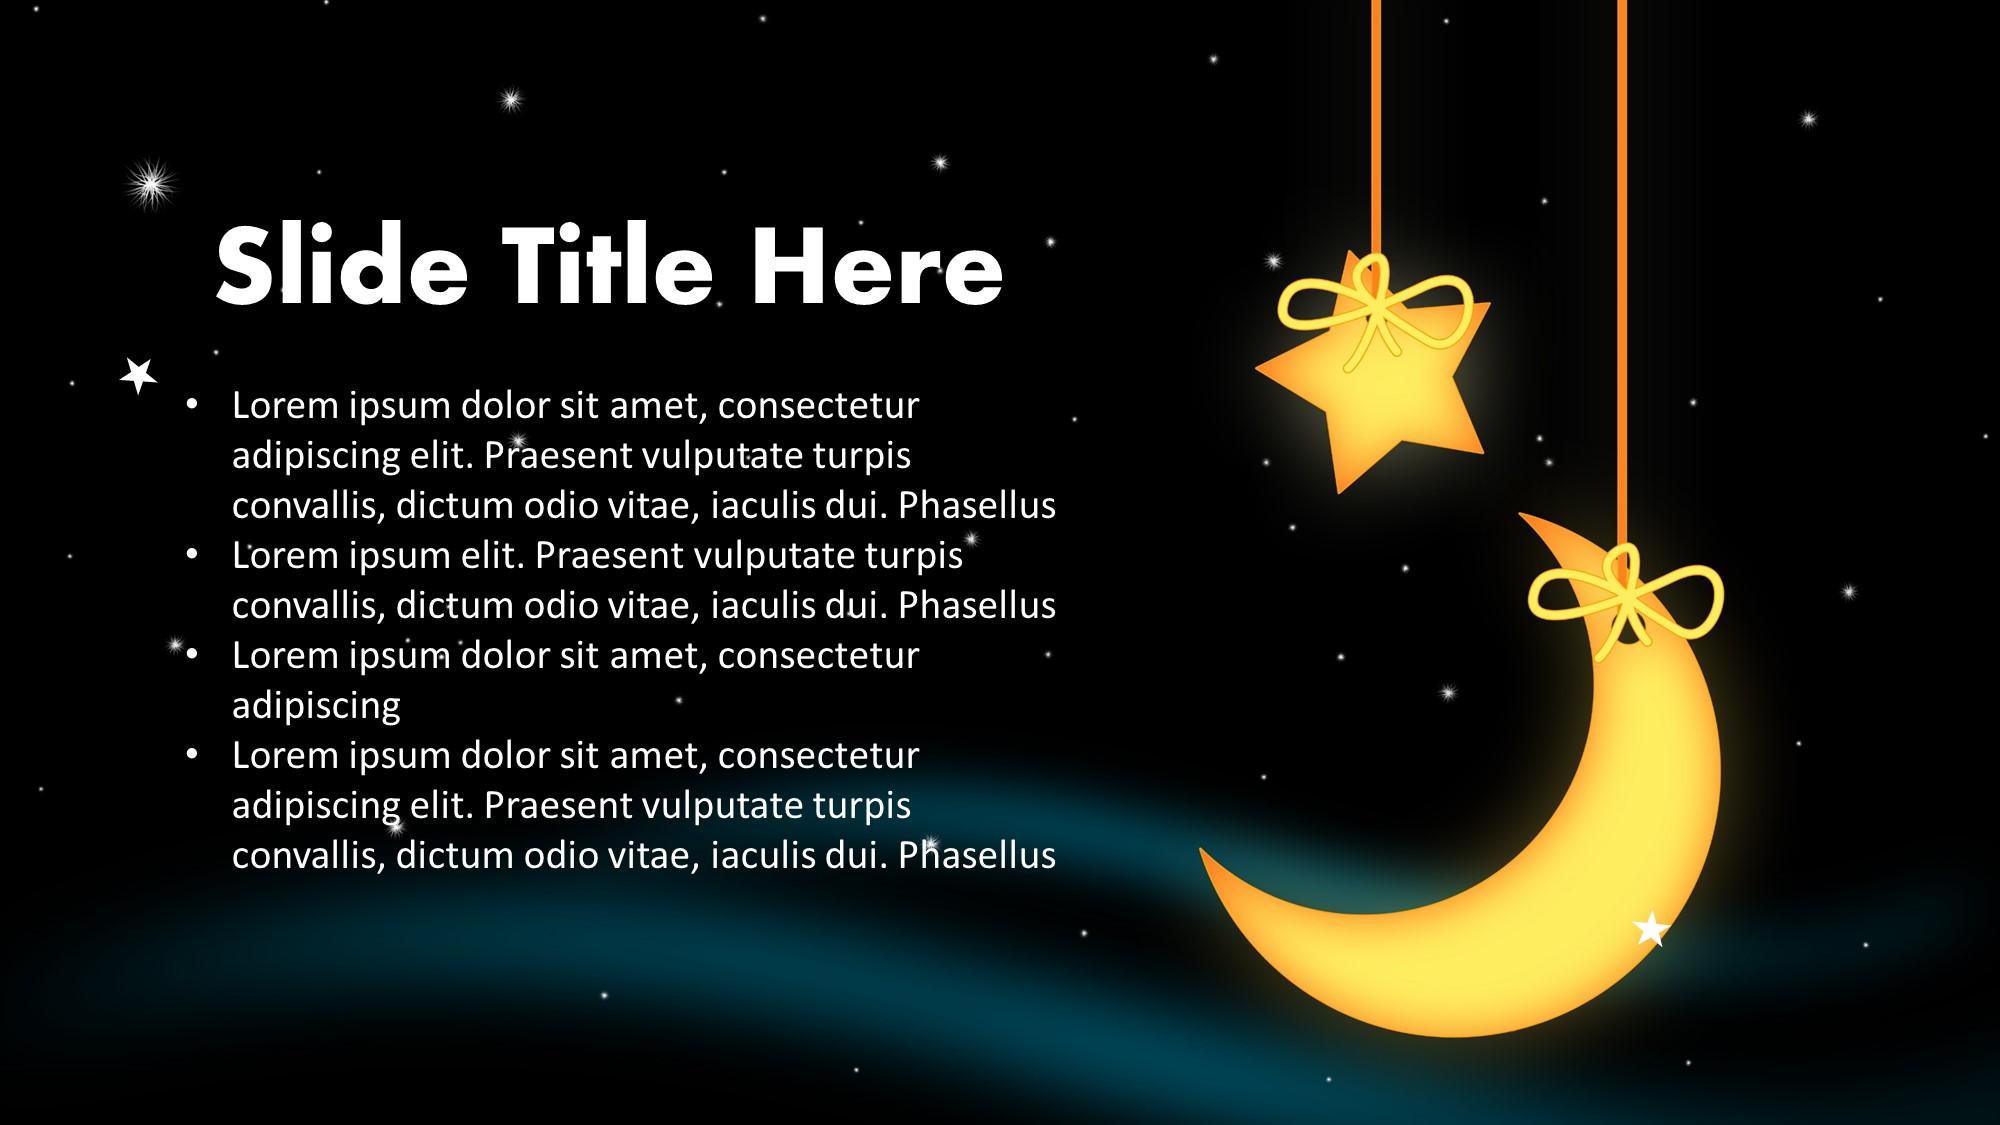 lullaby slide for presentation